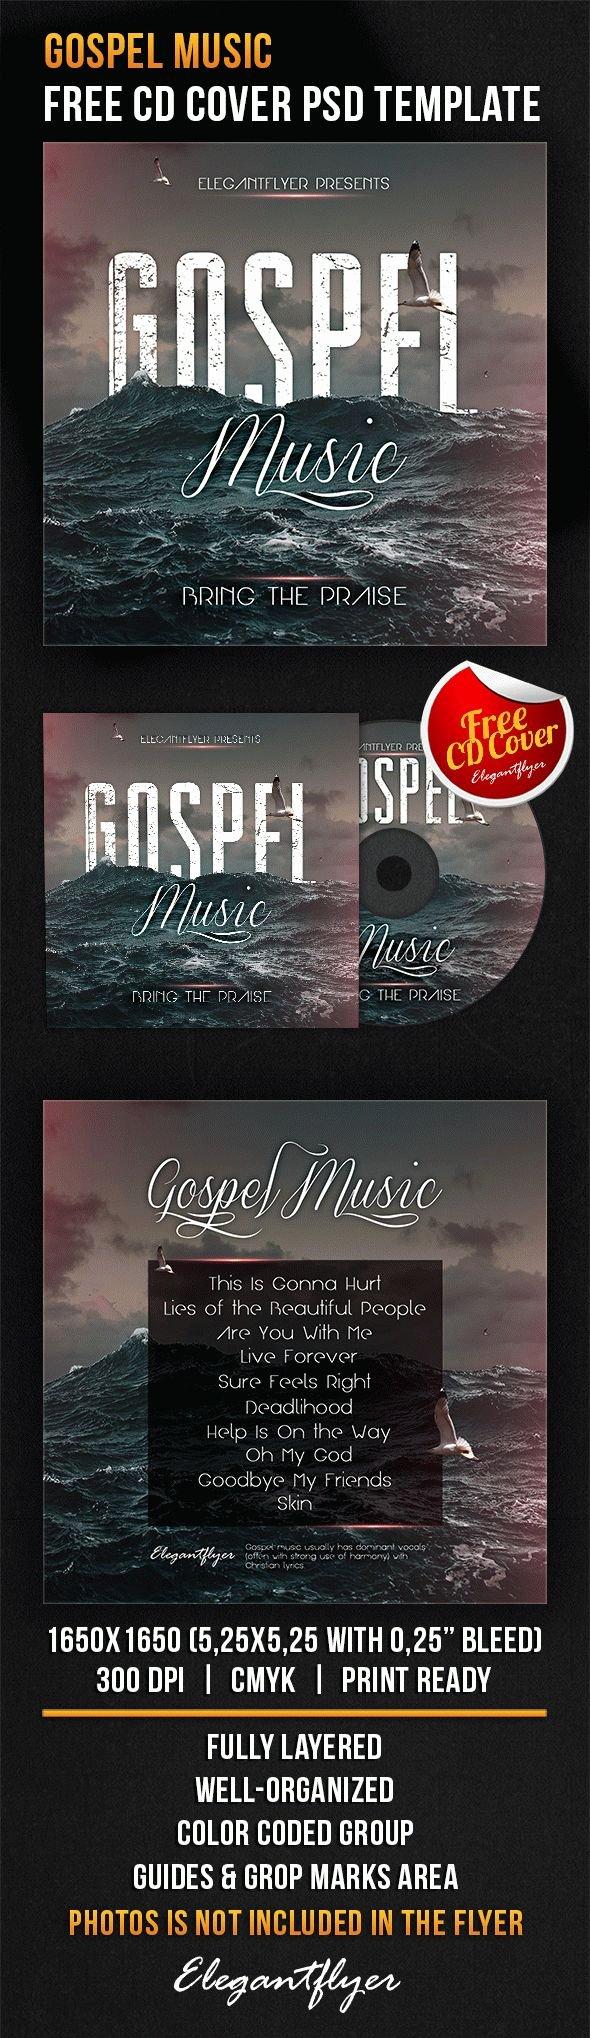 Gospel Music – Free Cd Cover Psd Template – by Elegantflyer